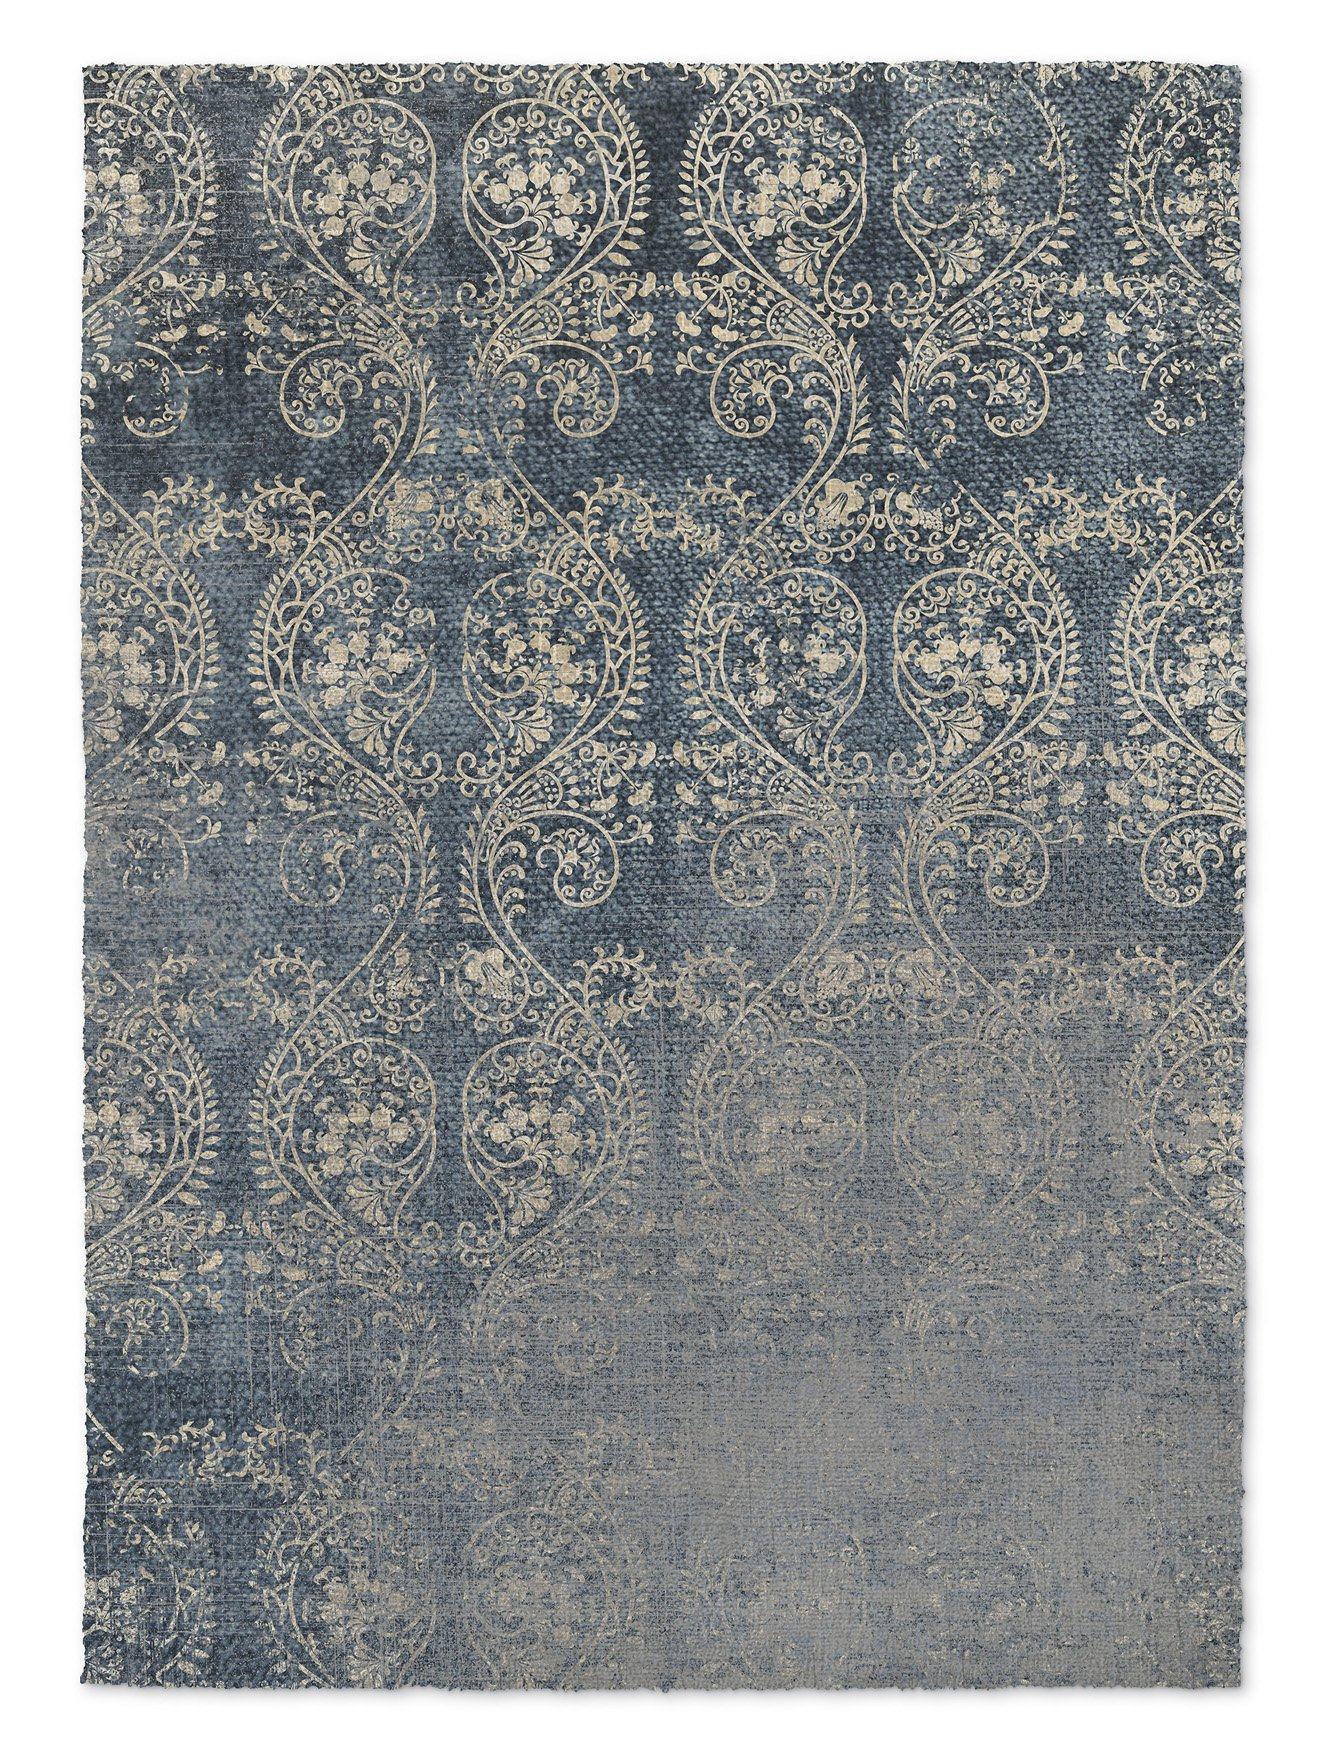 KAVKA Designs Cleo Area Rug, (Blue) - PARISIAN Collection, Size: 5x7x.5 - (TELAVC8222RUG57)